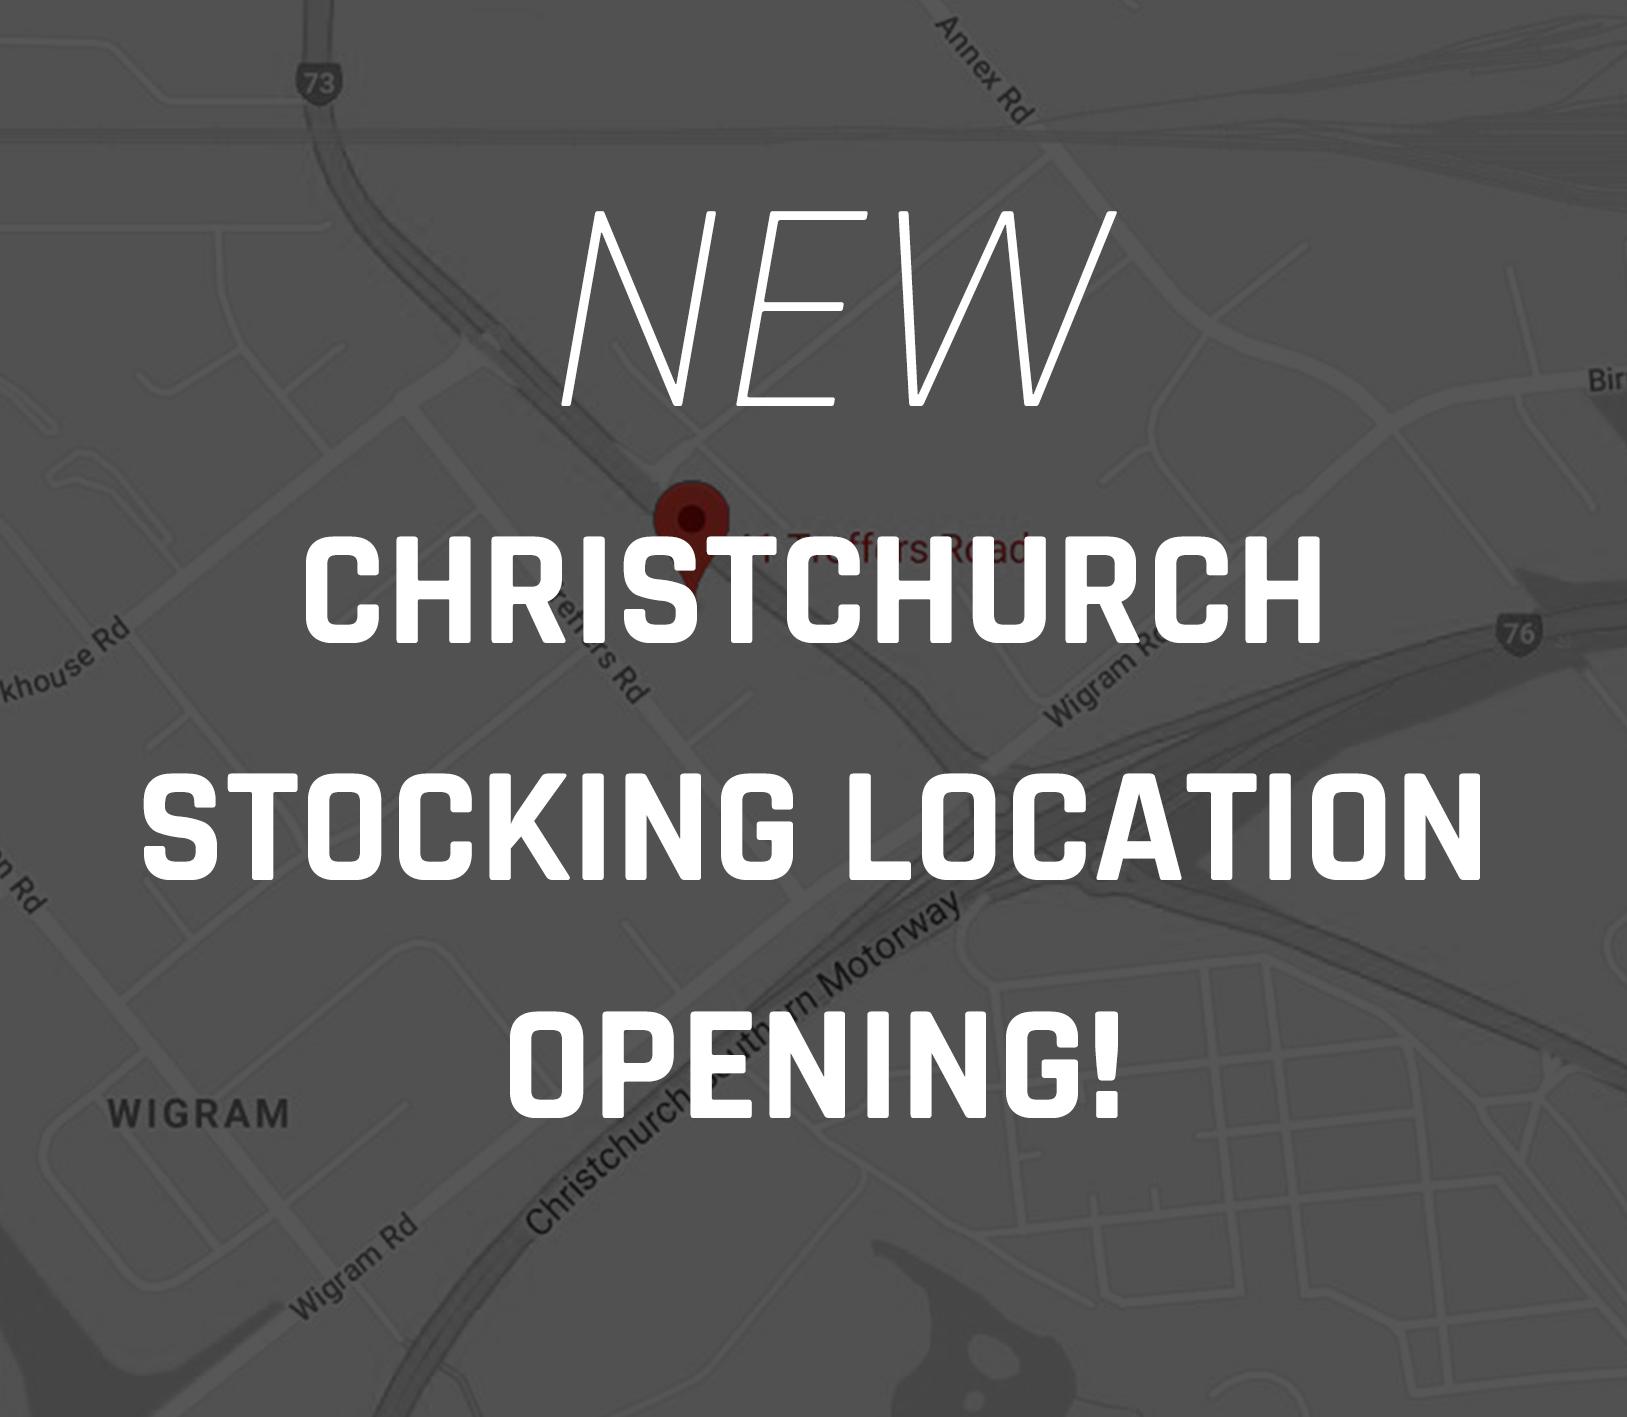 NEW: Christchurch Stocking Location